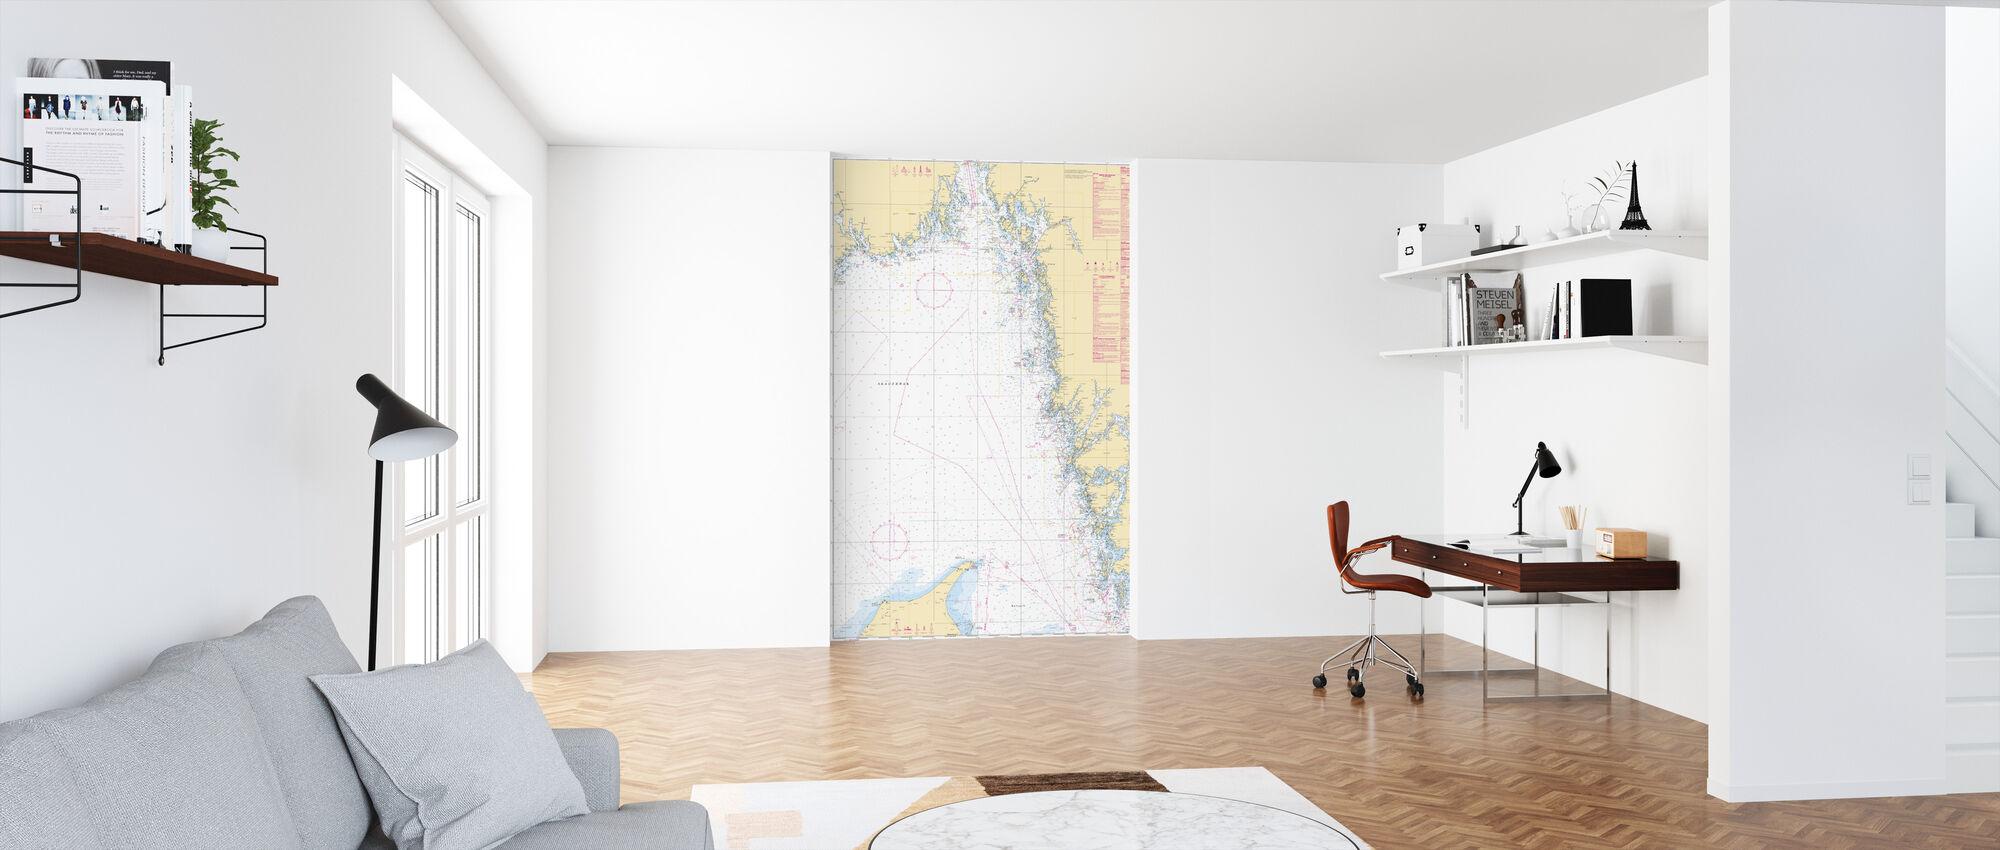 Sea Chart 93 - Skagerrak - Wallpaper - Office